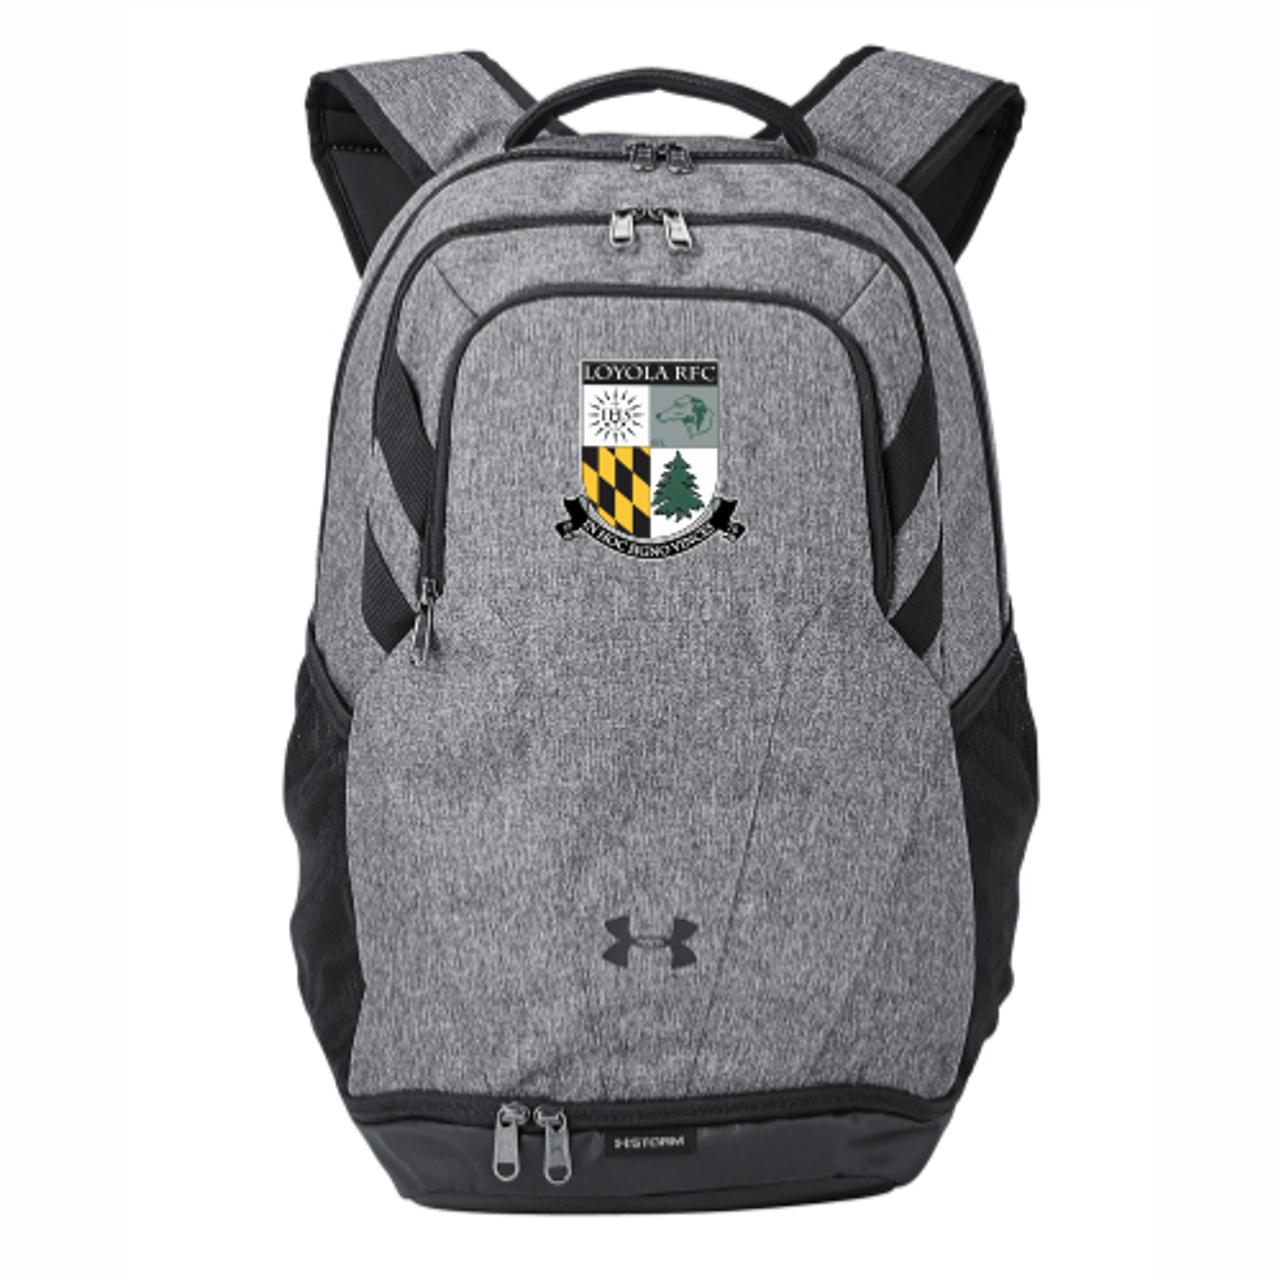 Loyola Rugby UA Team Hustle 3.0 Backpack, Graphite Heather